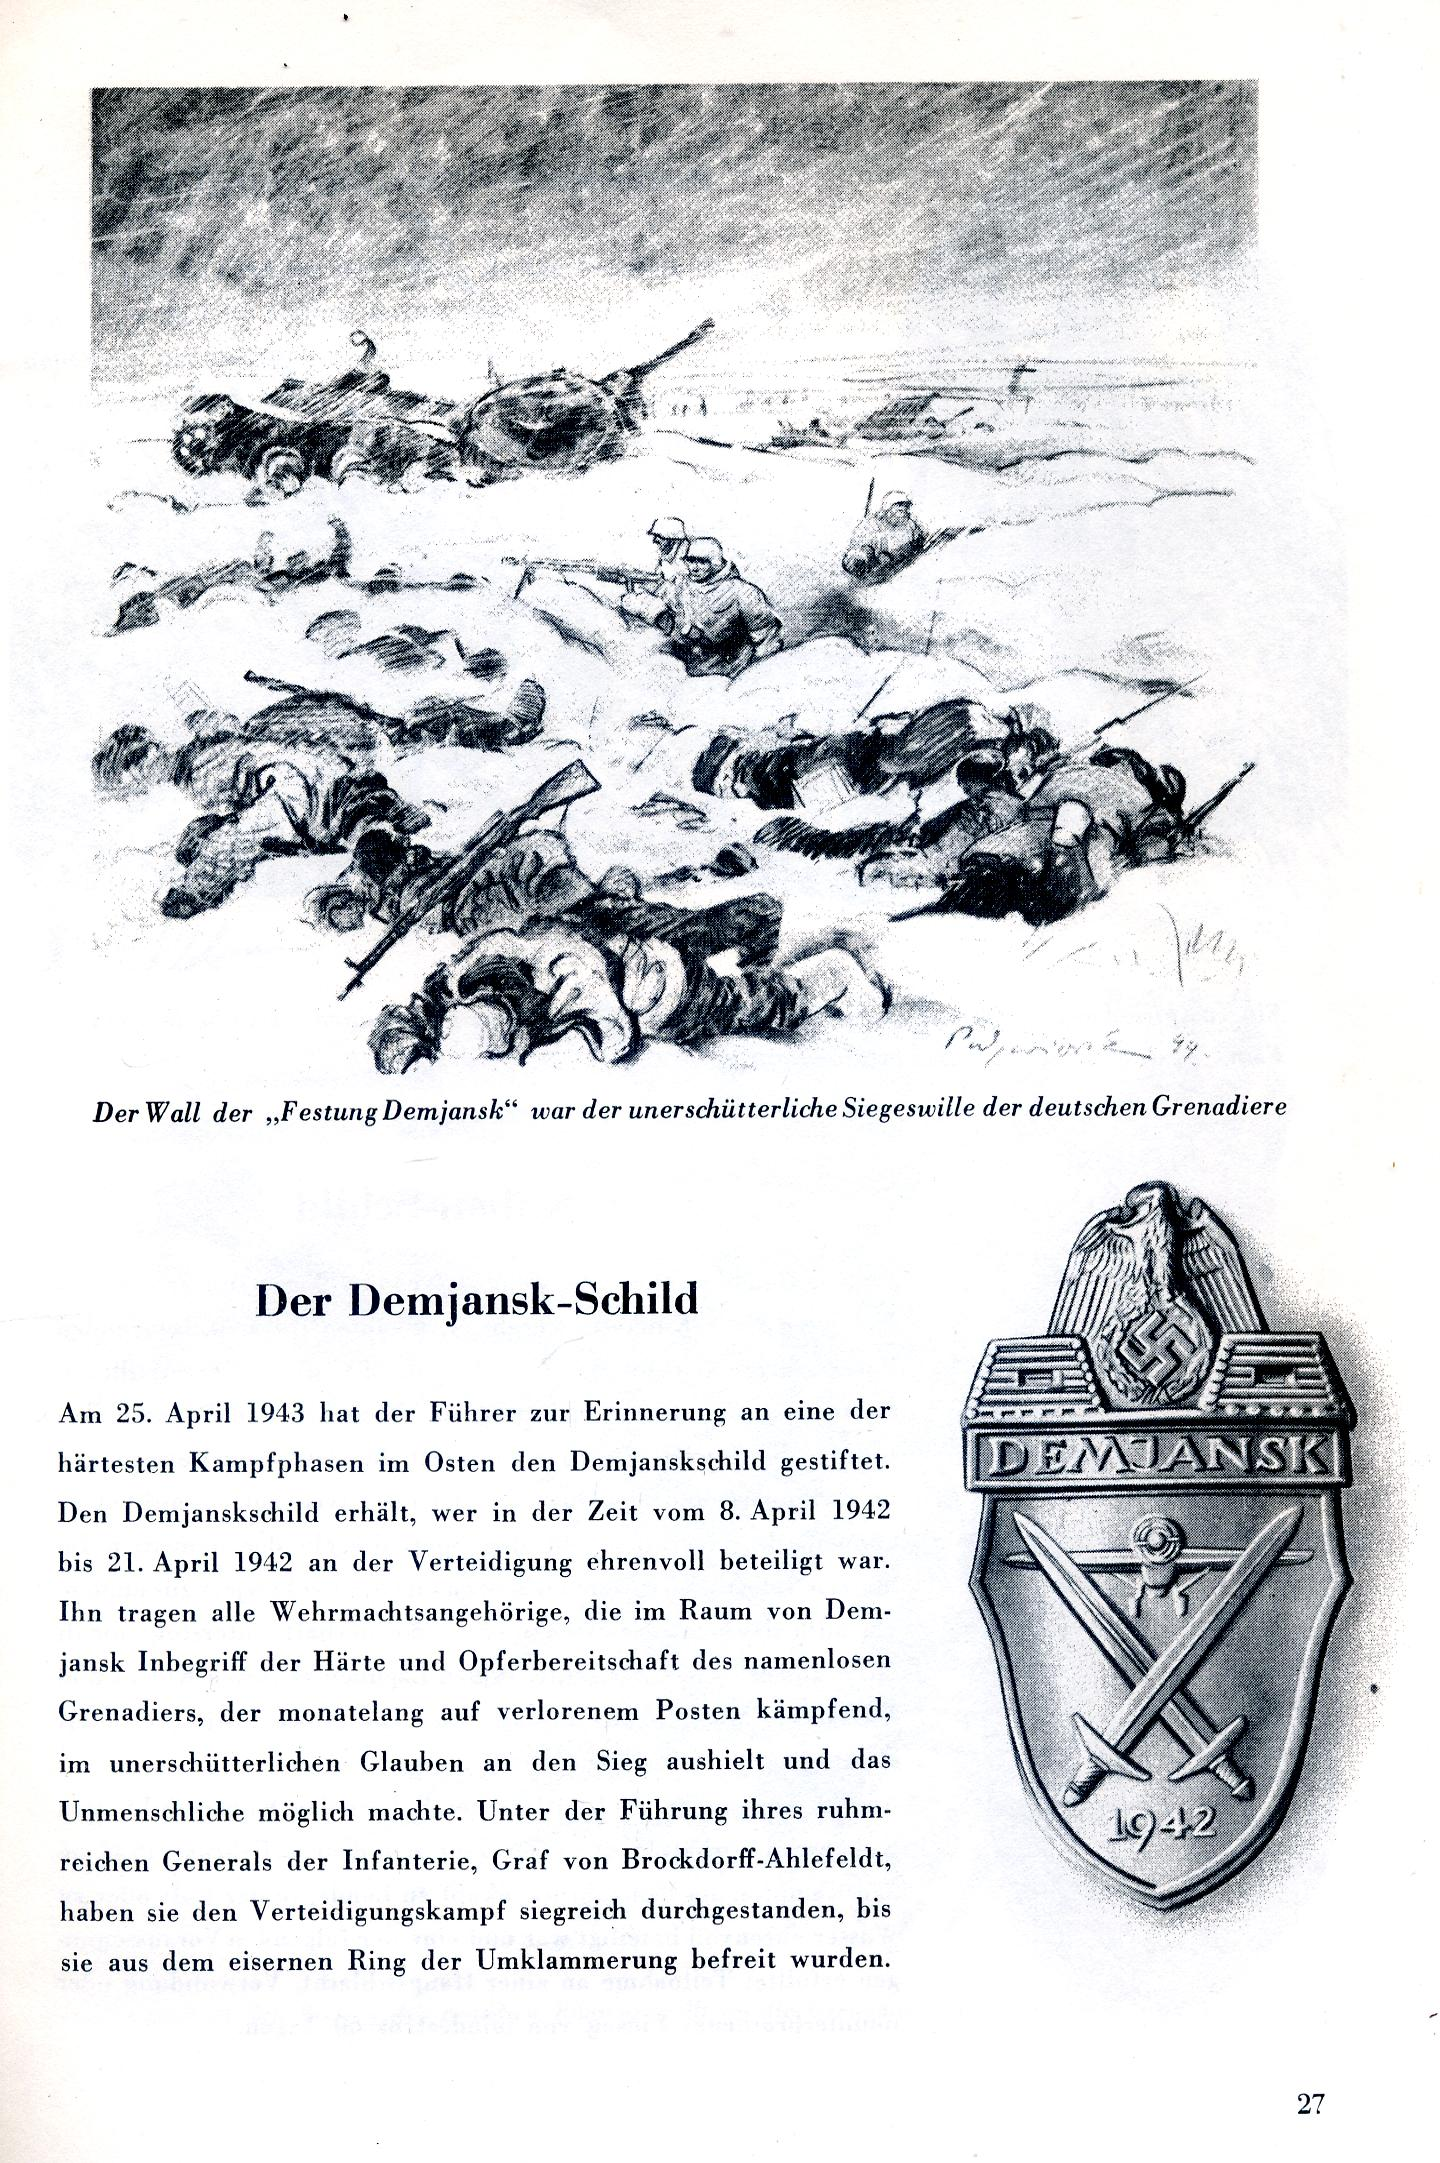 DEMJANSK ARMSHIELD ORIGINAL PERIOD ARTICLE